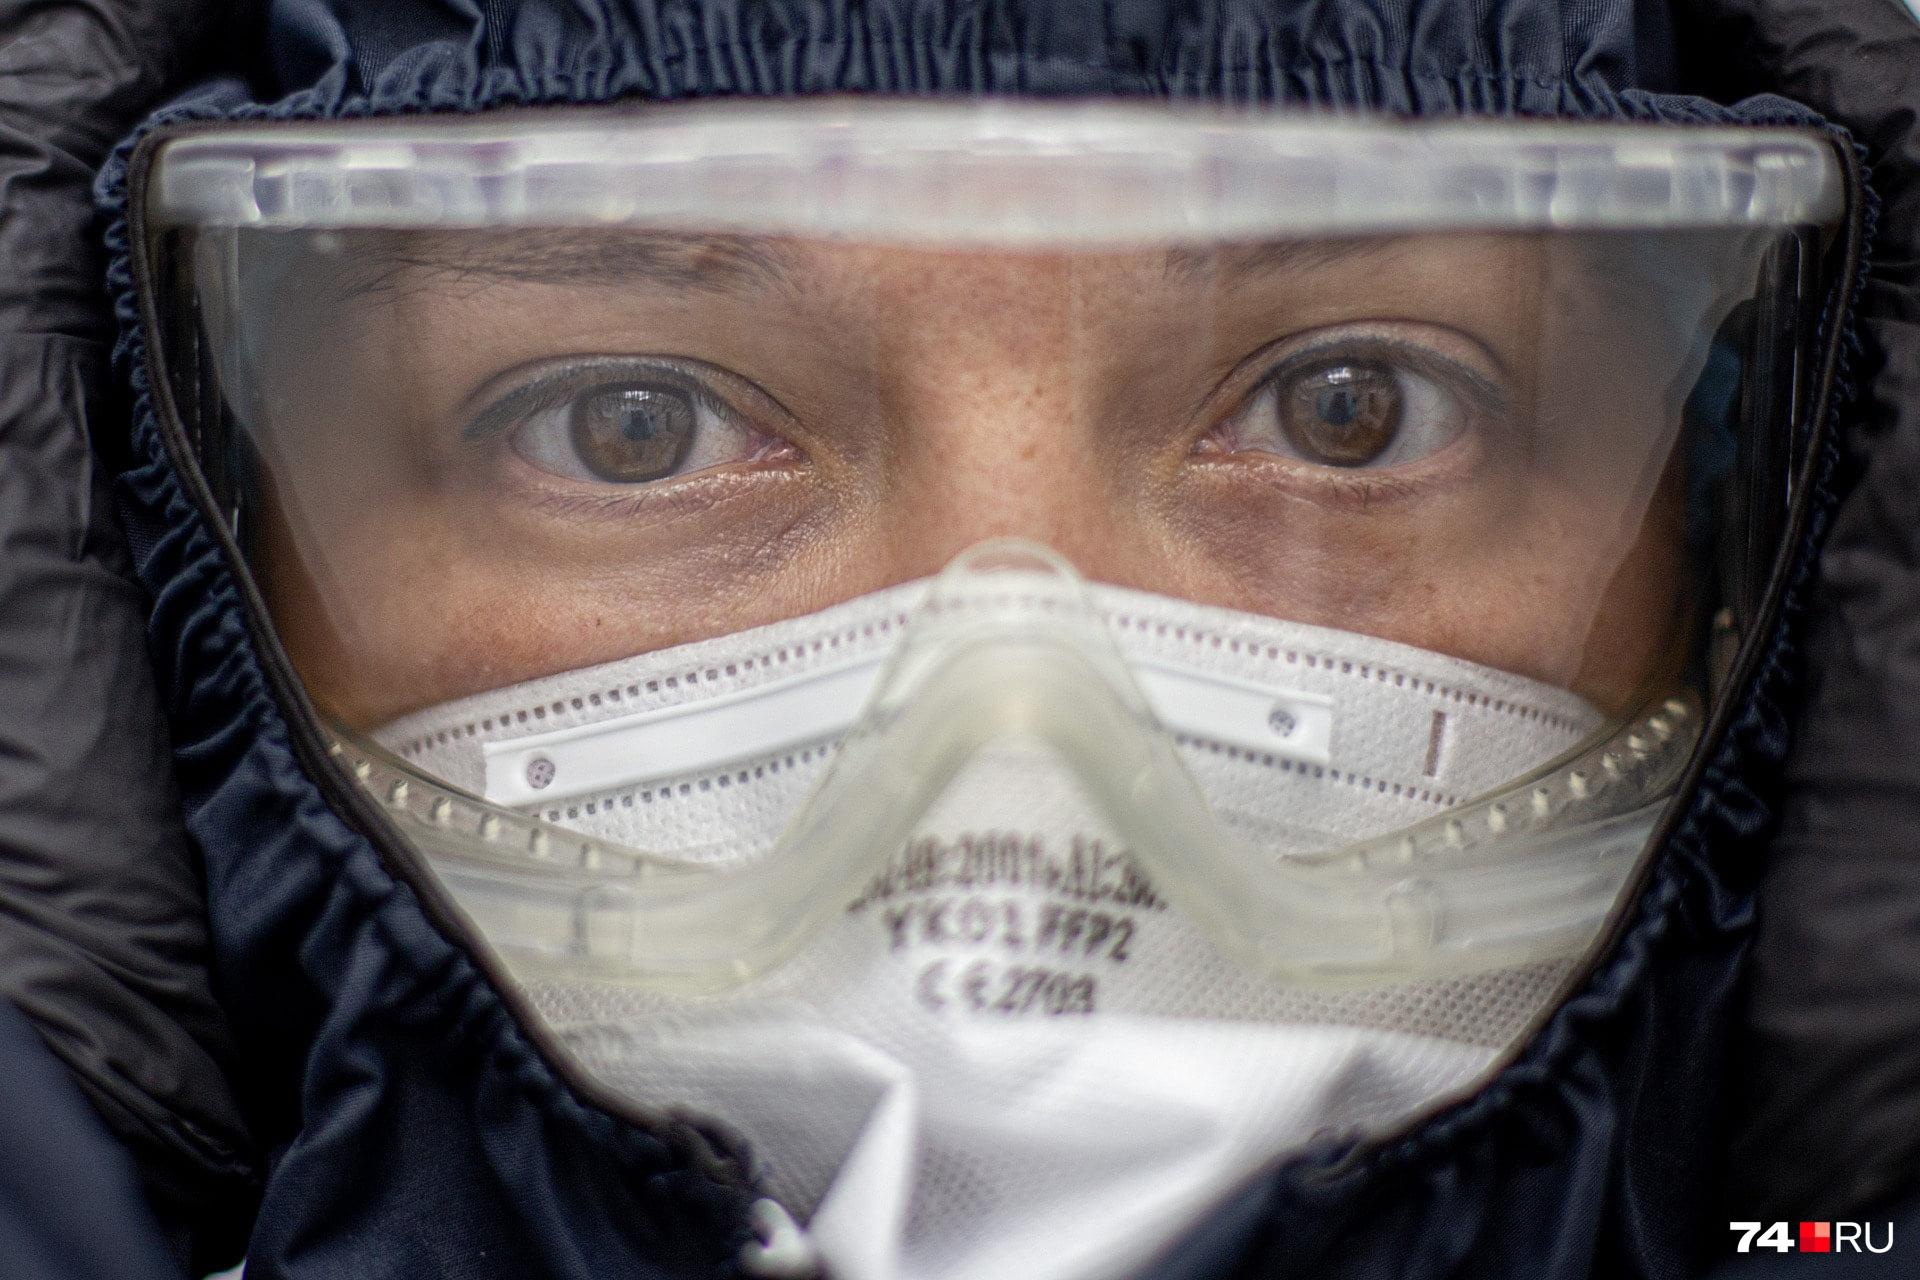 Лицо врача увековечили на фотографиях, билбордах и граффити